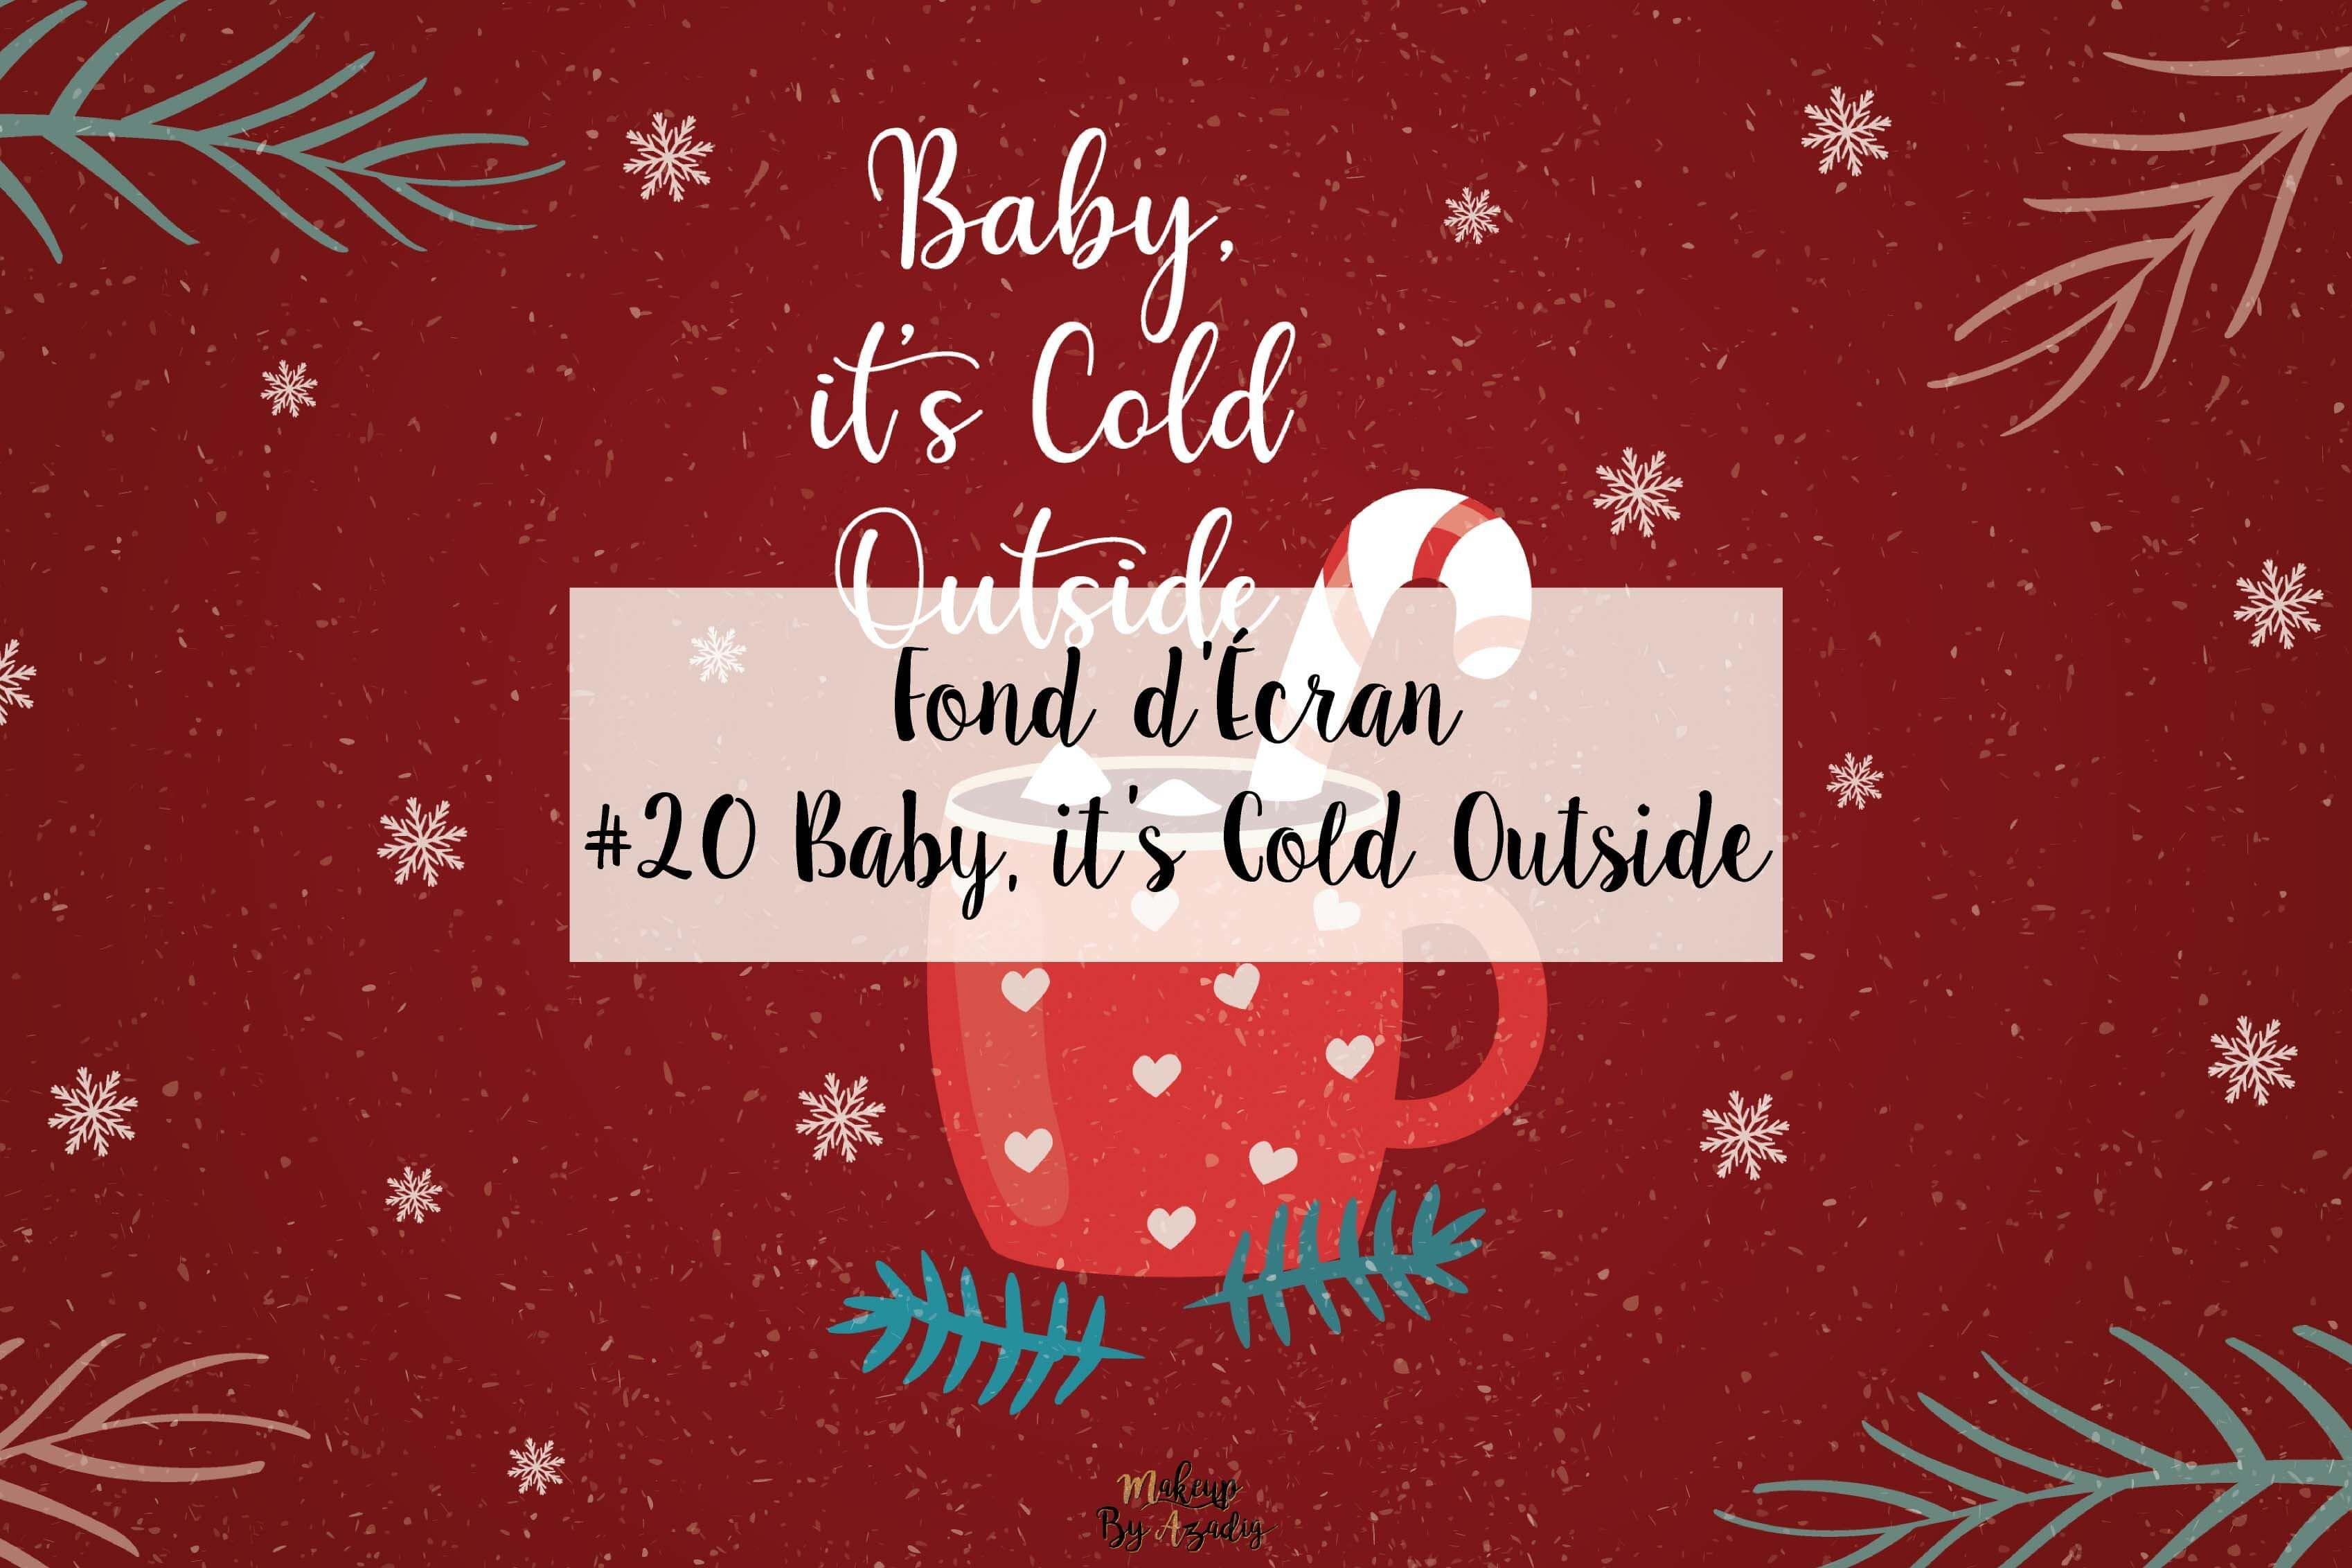 20 Fond D Ecran Baby It S Cold Outside Wallpaper Makeupbyazadig En 2020 Fond D Ecran Ordinateur Telephone Iphone Tablette Ipad